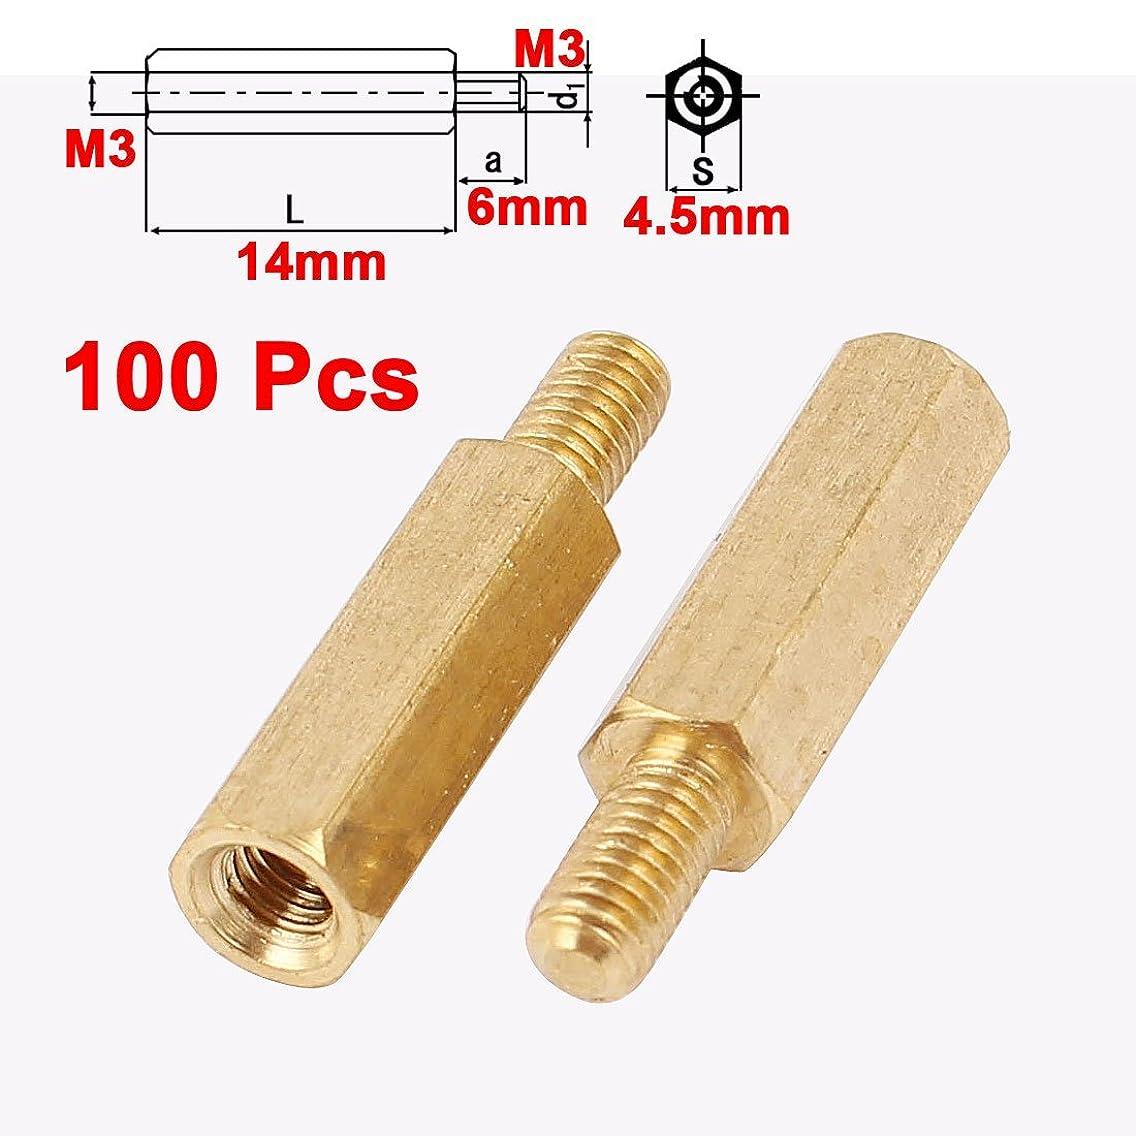 100Pcs M3 Thread 14mm+6mm Brass Hex Standoff Spacer Pillar for PCB